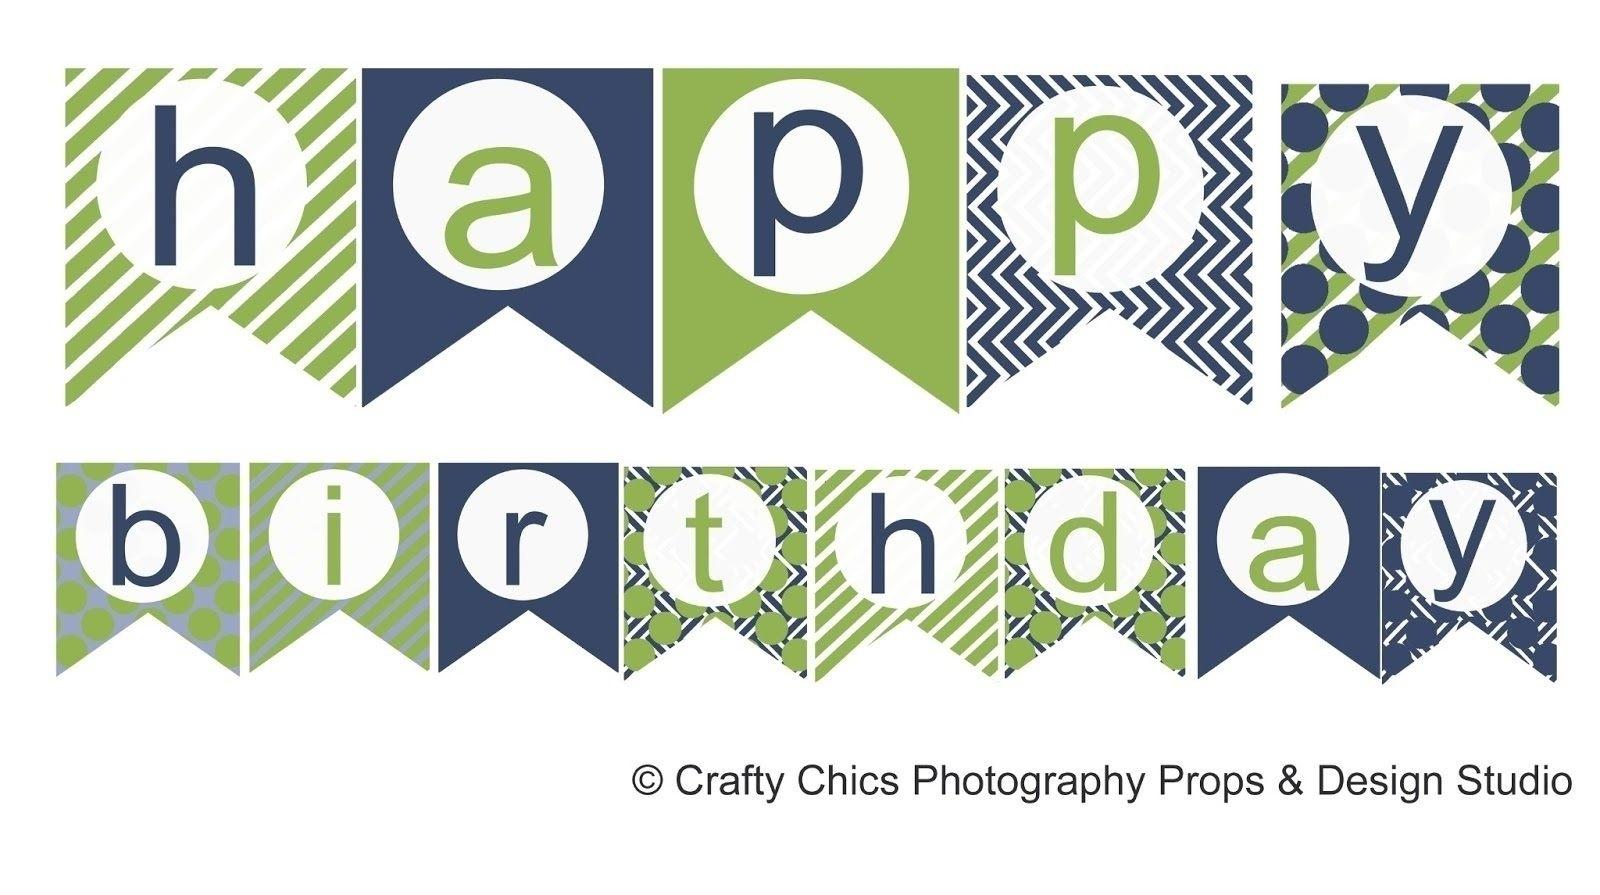 Happy Birthday Banner Template Printable | World Of Label - Free Printable Happy Birthday Banner Templates